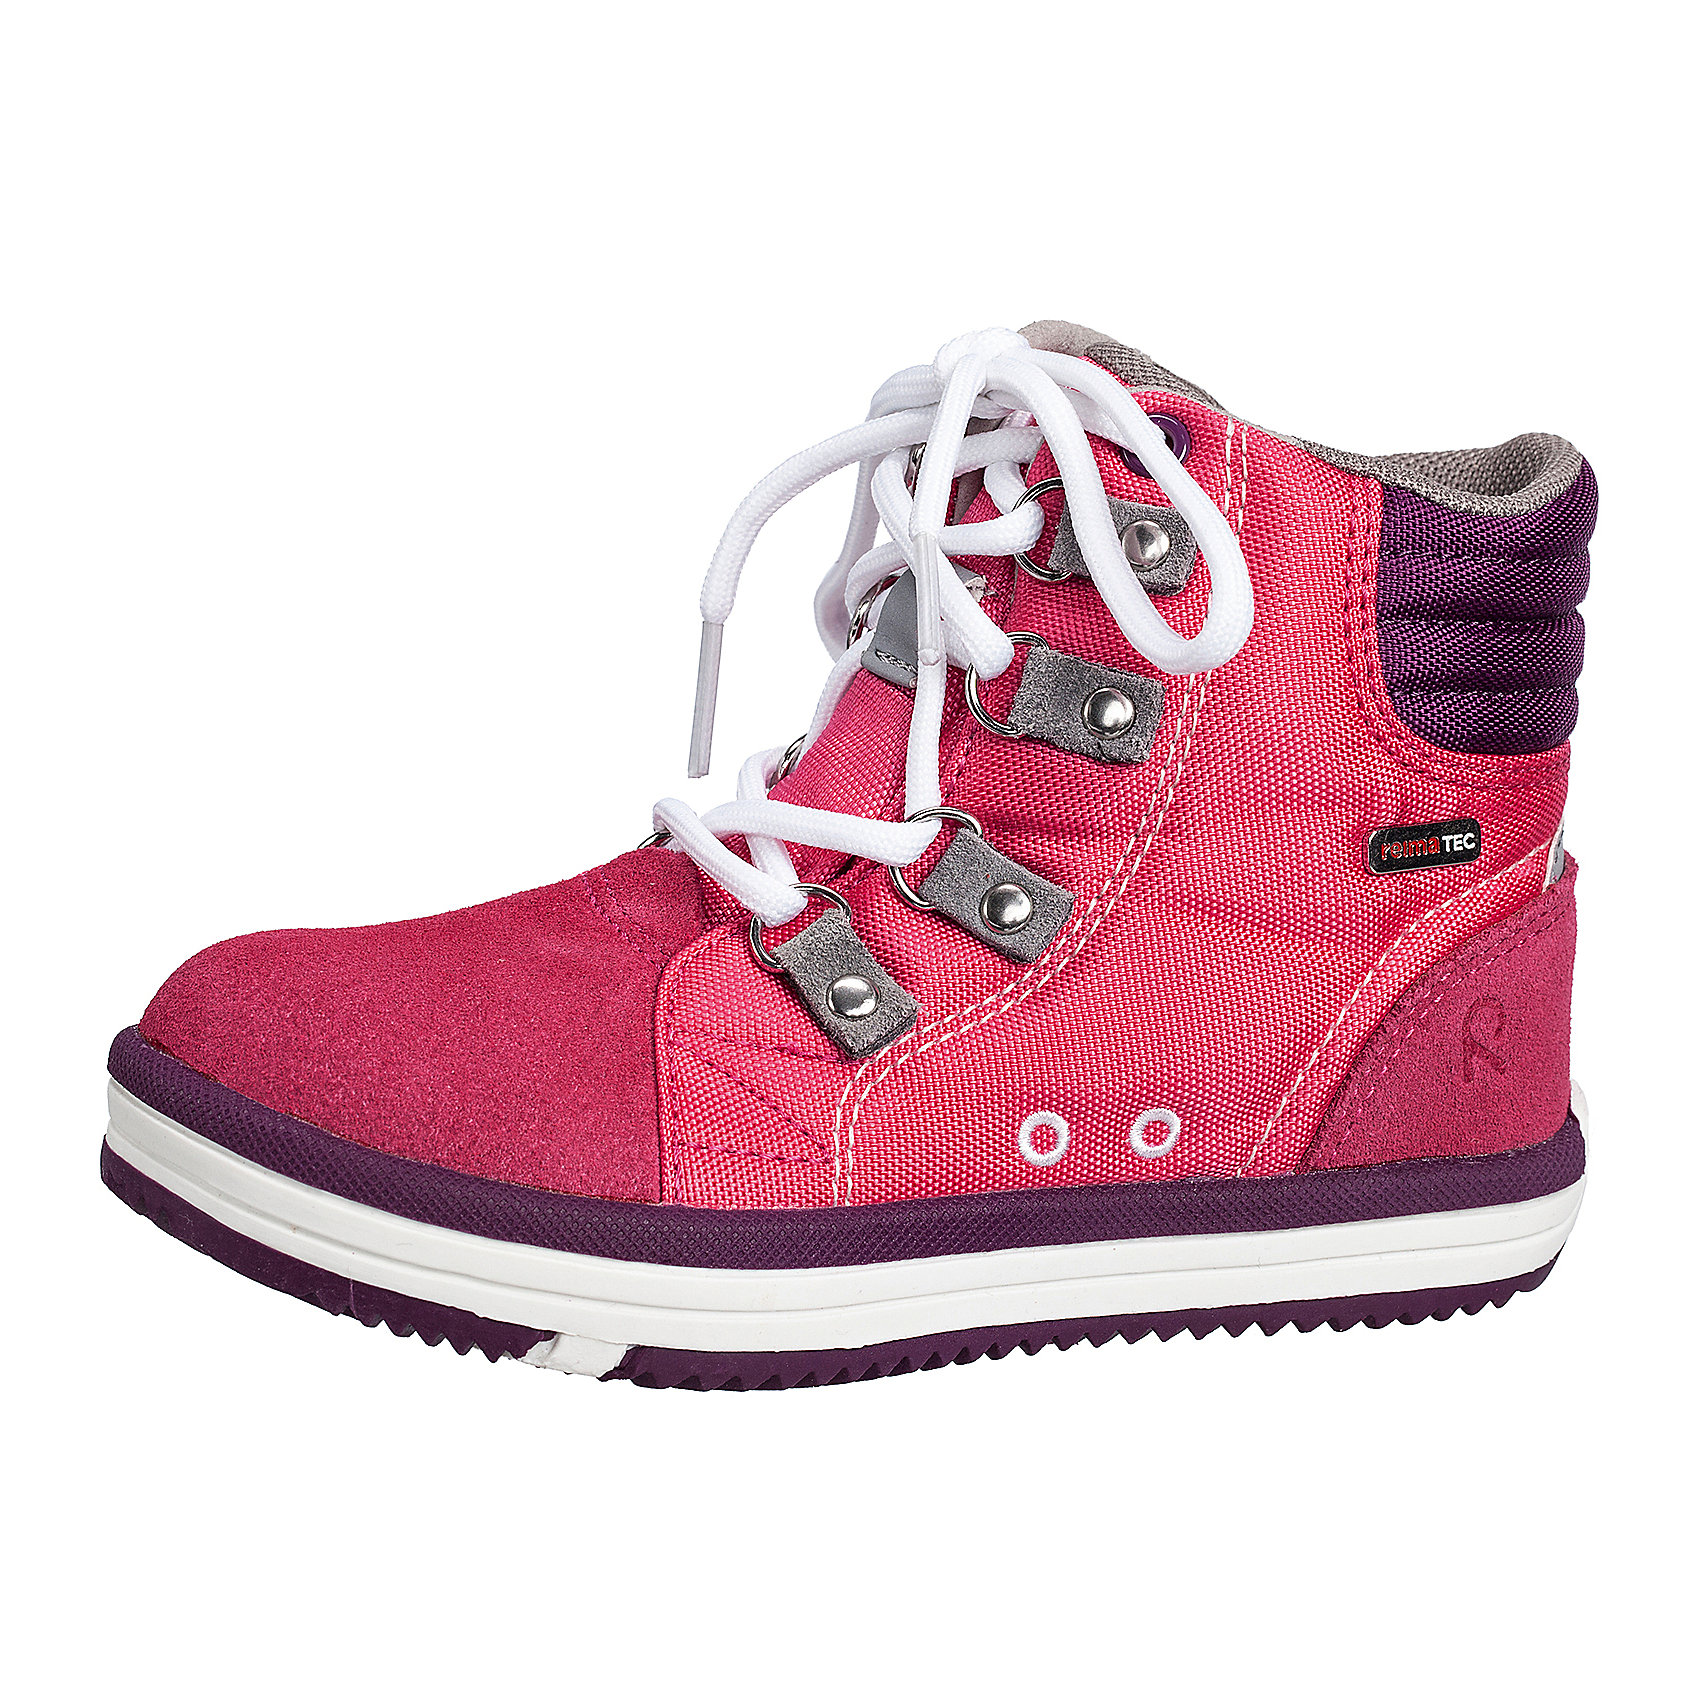 Reima Ботинки для девочки Wetter Reimatec Reima мультиварка philips hd 4731 03